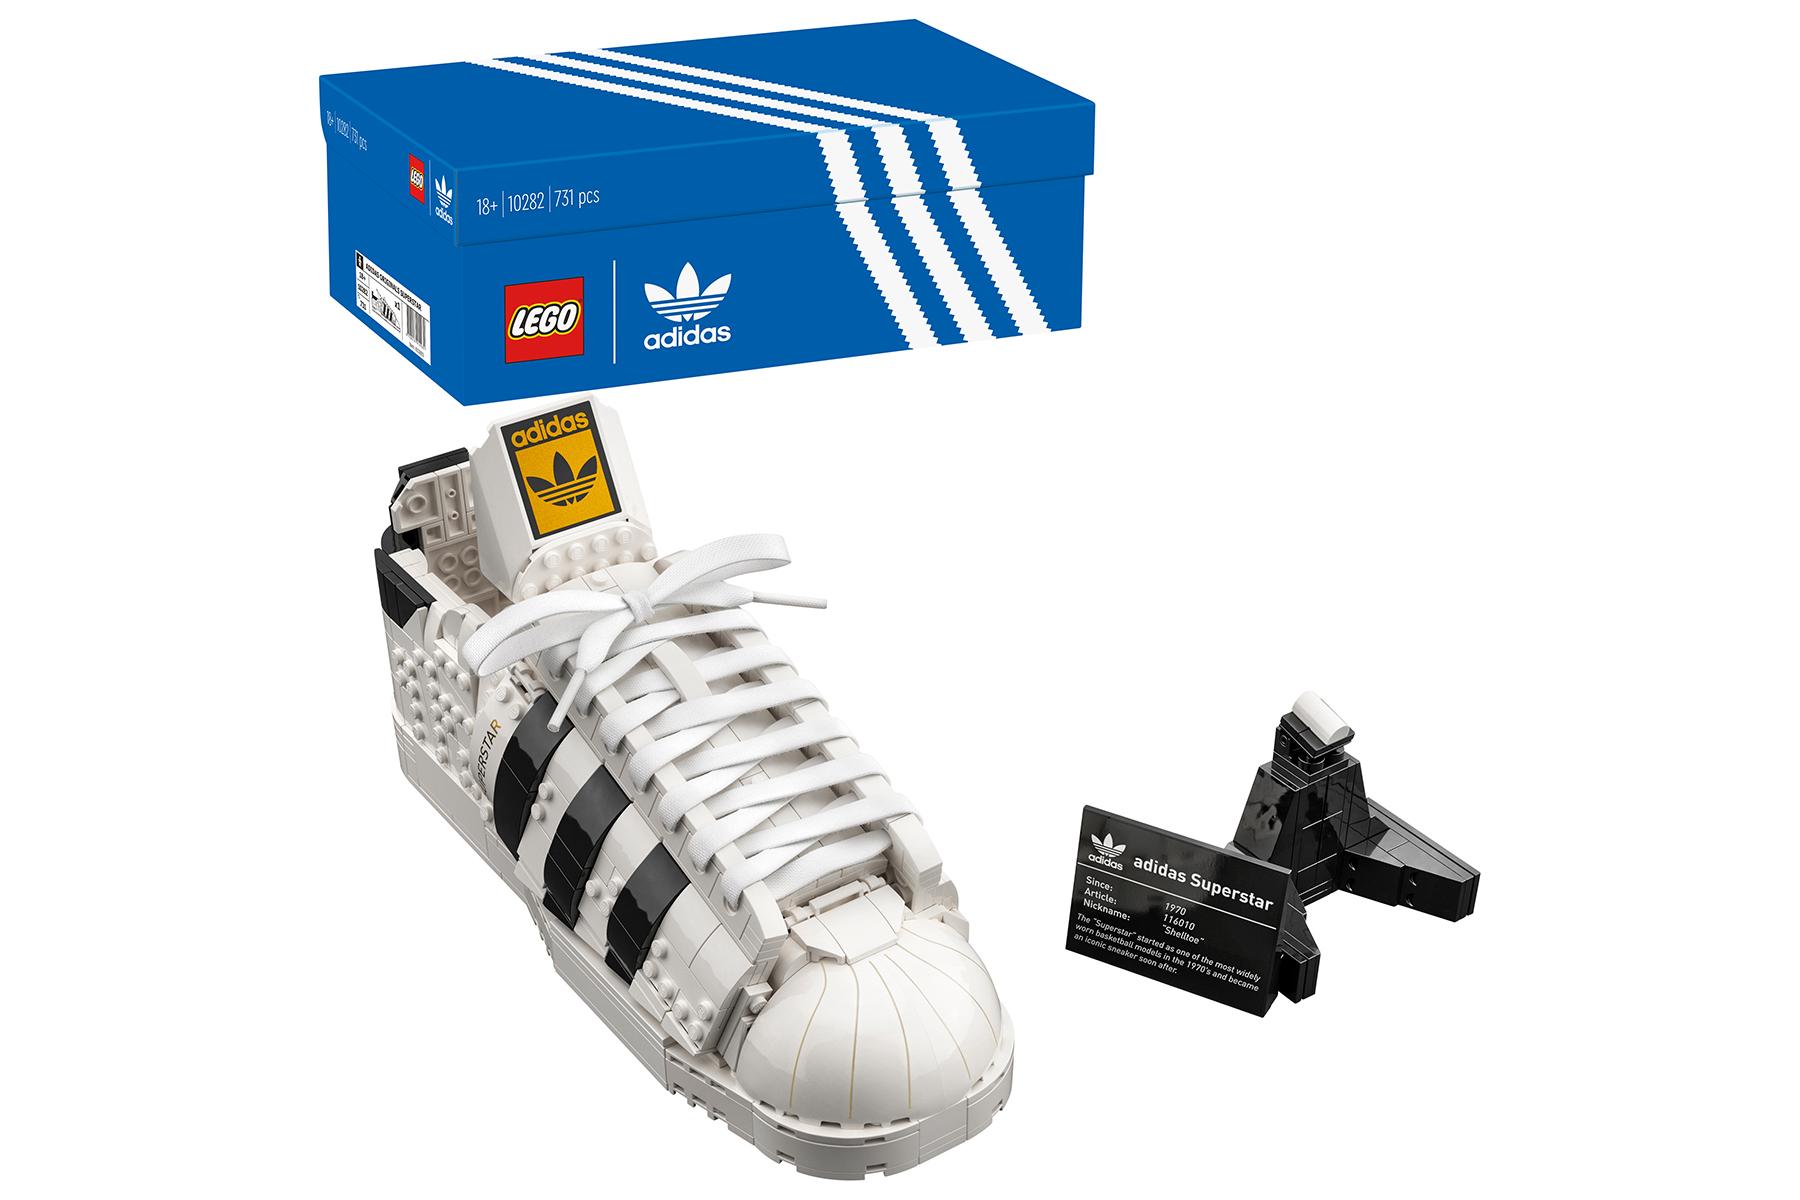 lego-adidas-originals-superstar-10282/